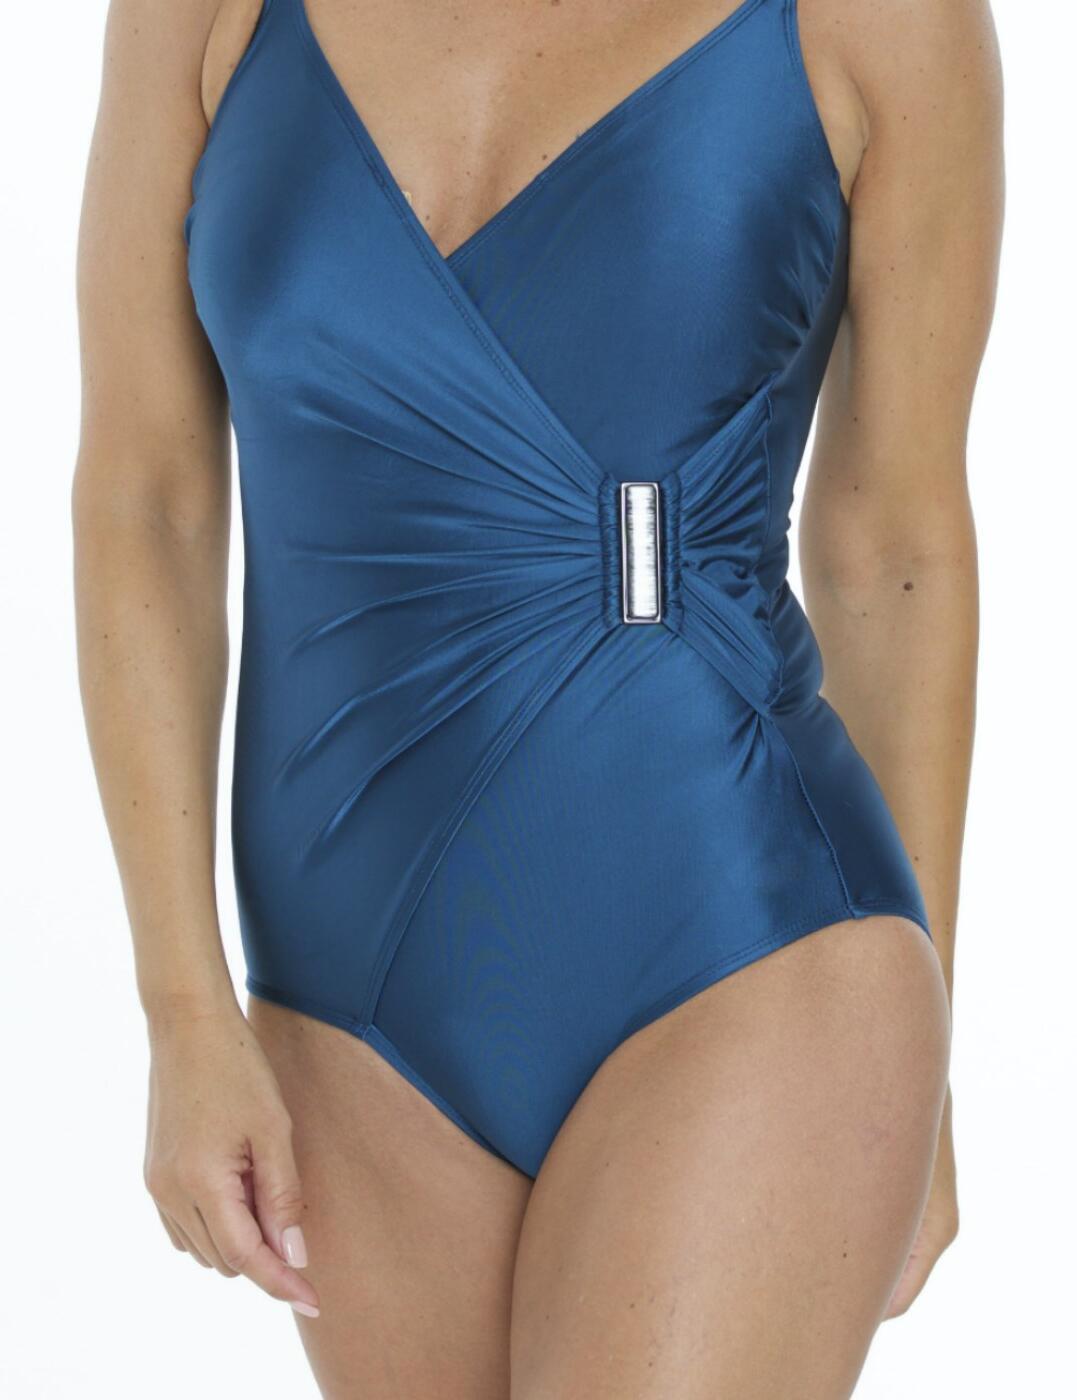 05-2112 SeaSpray Casablanca Side Buckle Swimsuit  - 05-2112 Teal